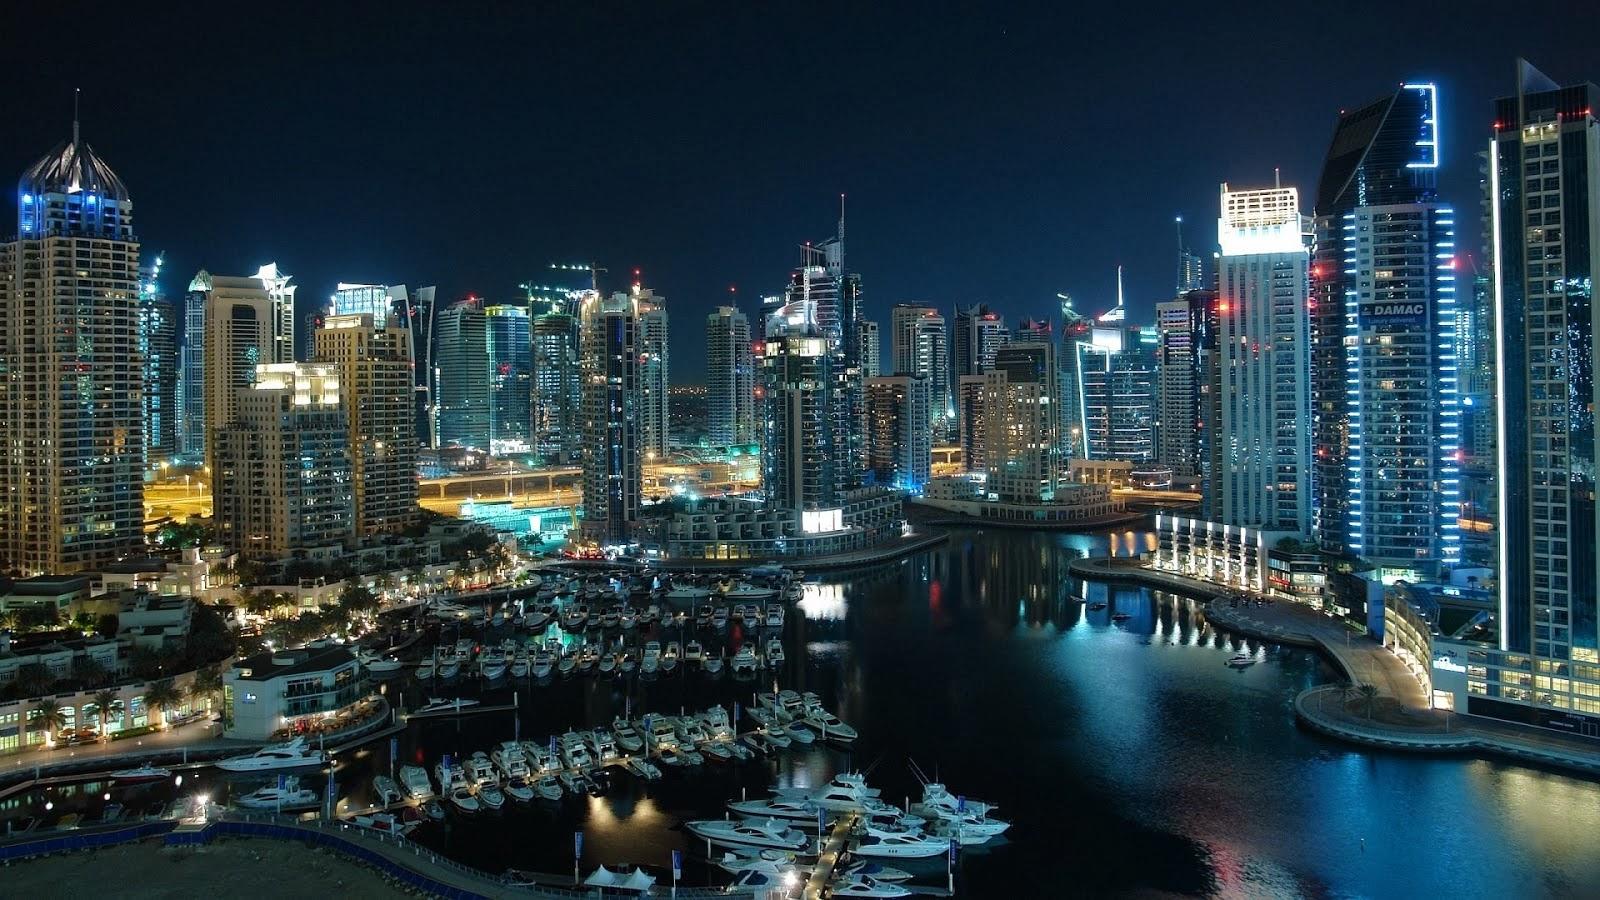 HD WALLPAPERS: Download Dubai City HD Wallpapers 1080p